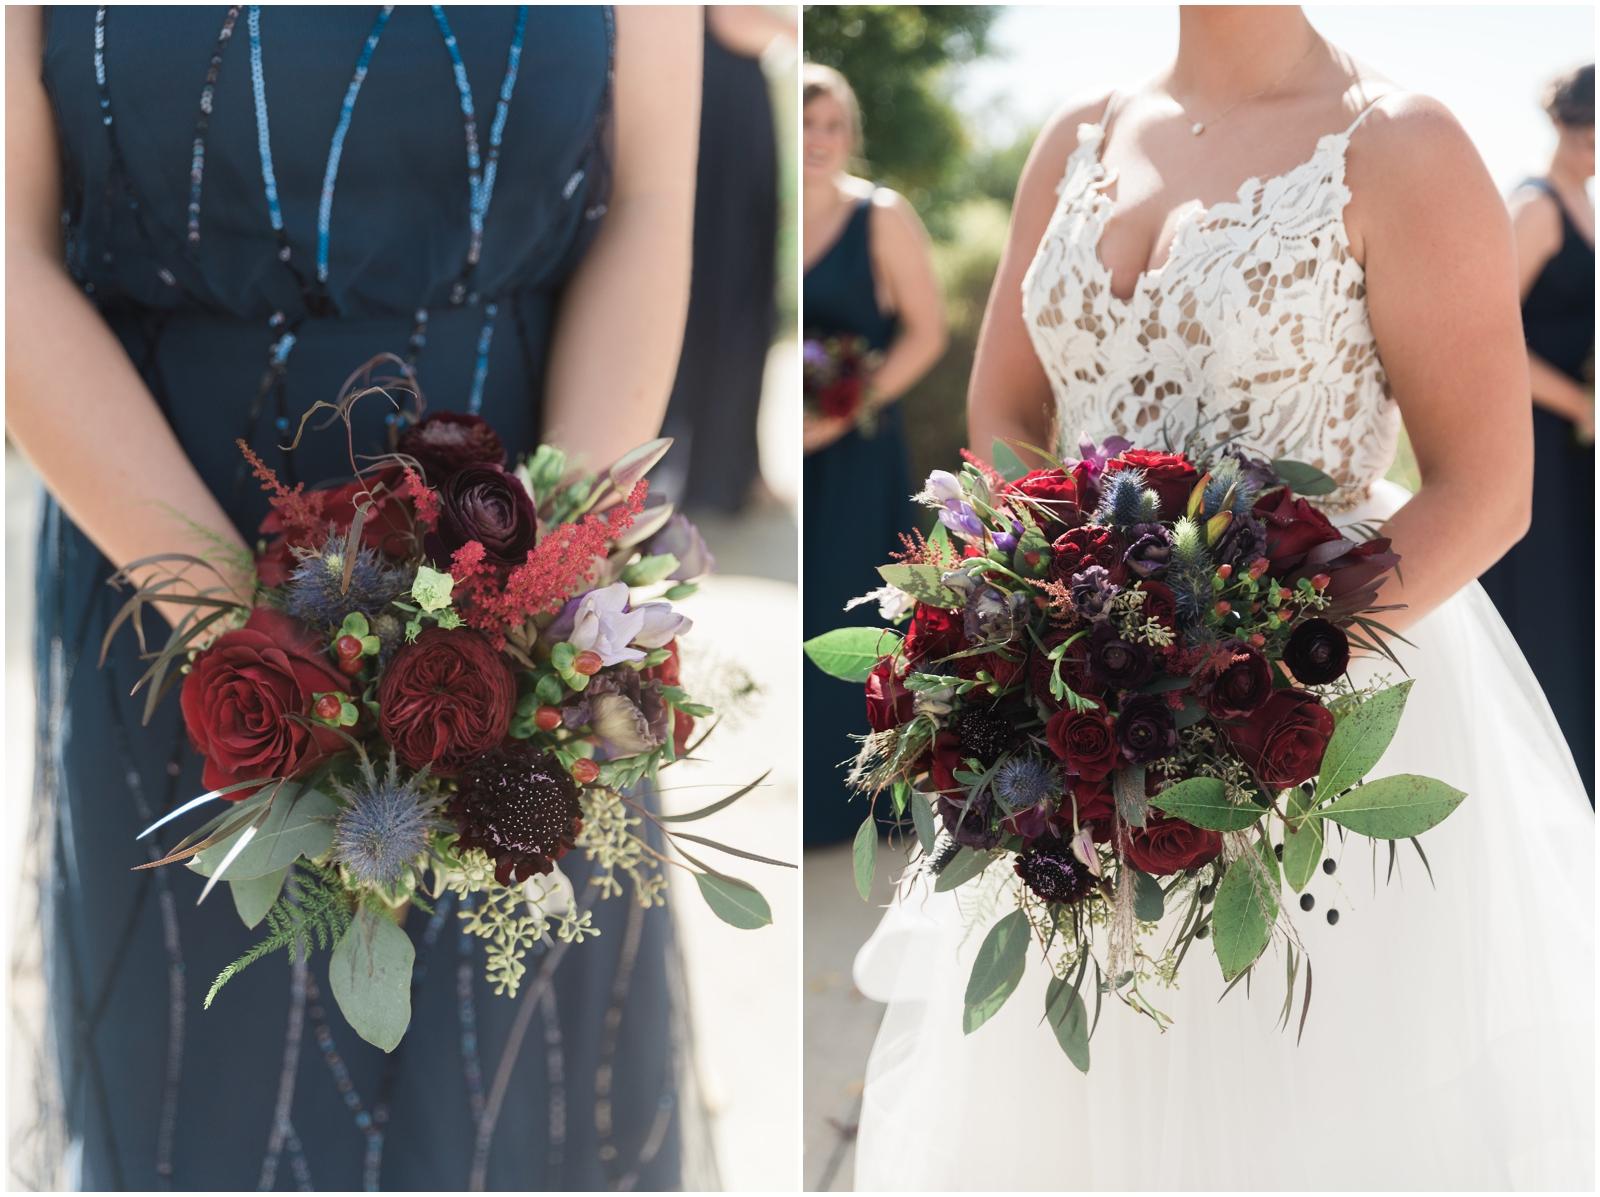 Minnesota-Wedding-Venue- Chaska-MN-Rustic-Barn-Weddings_0544.jpg